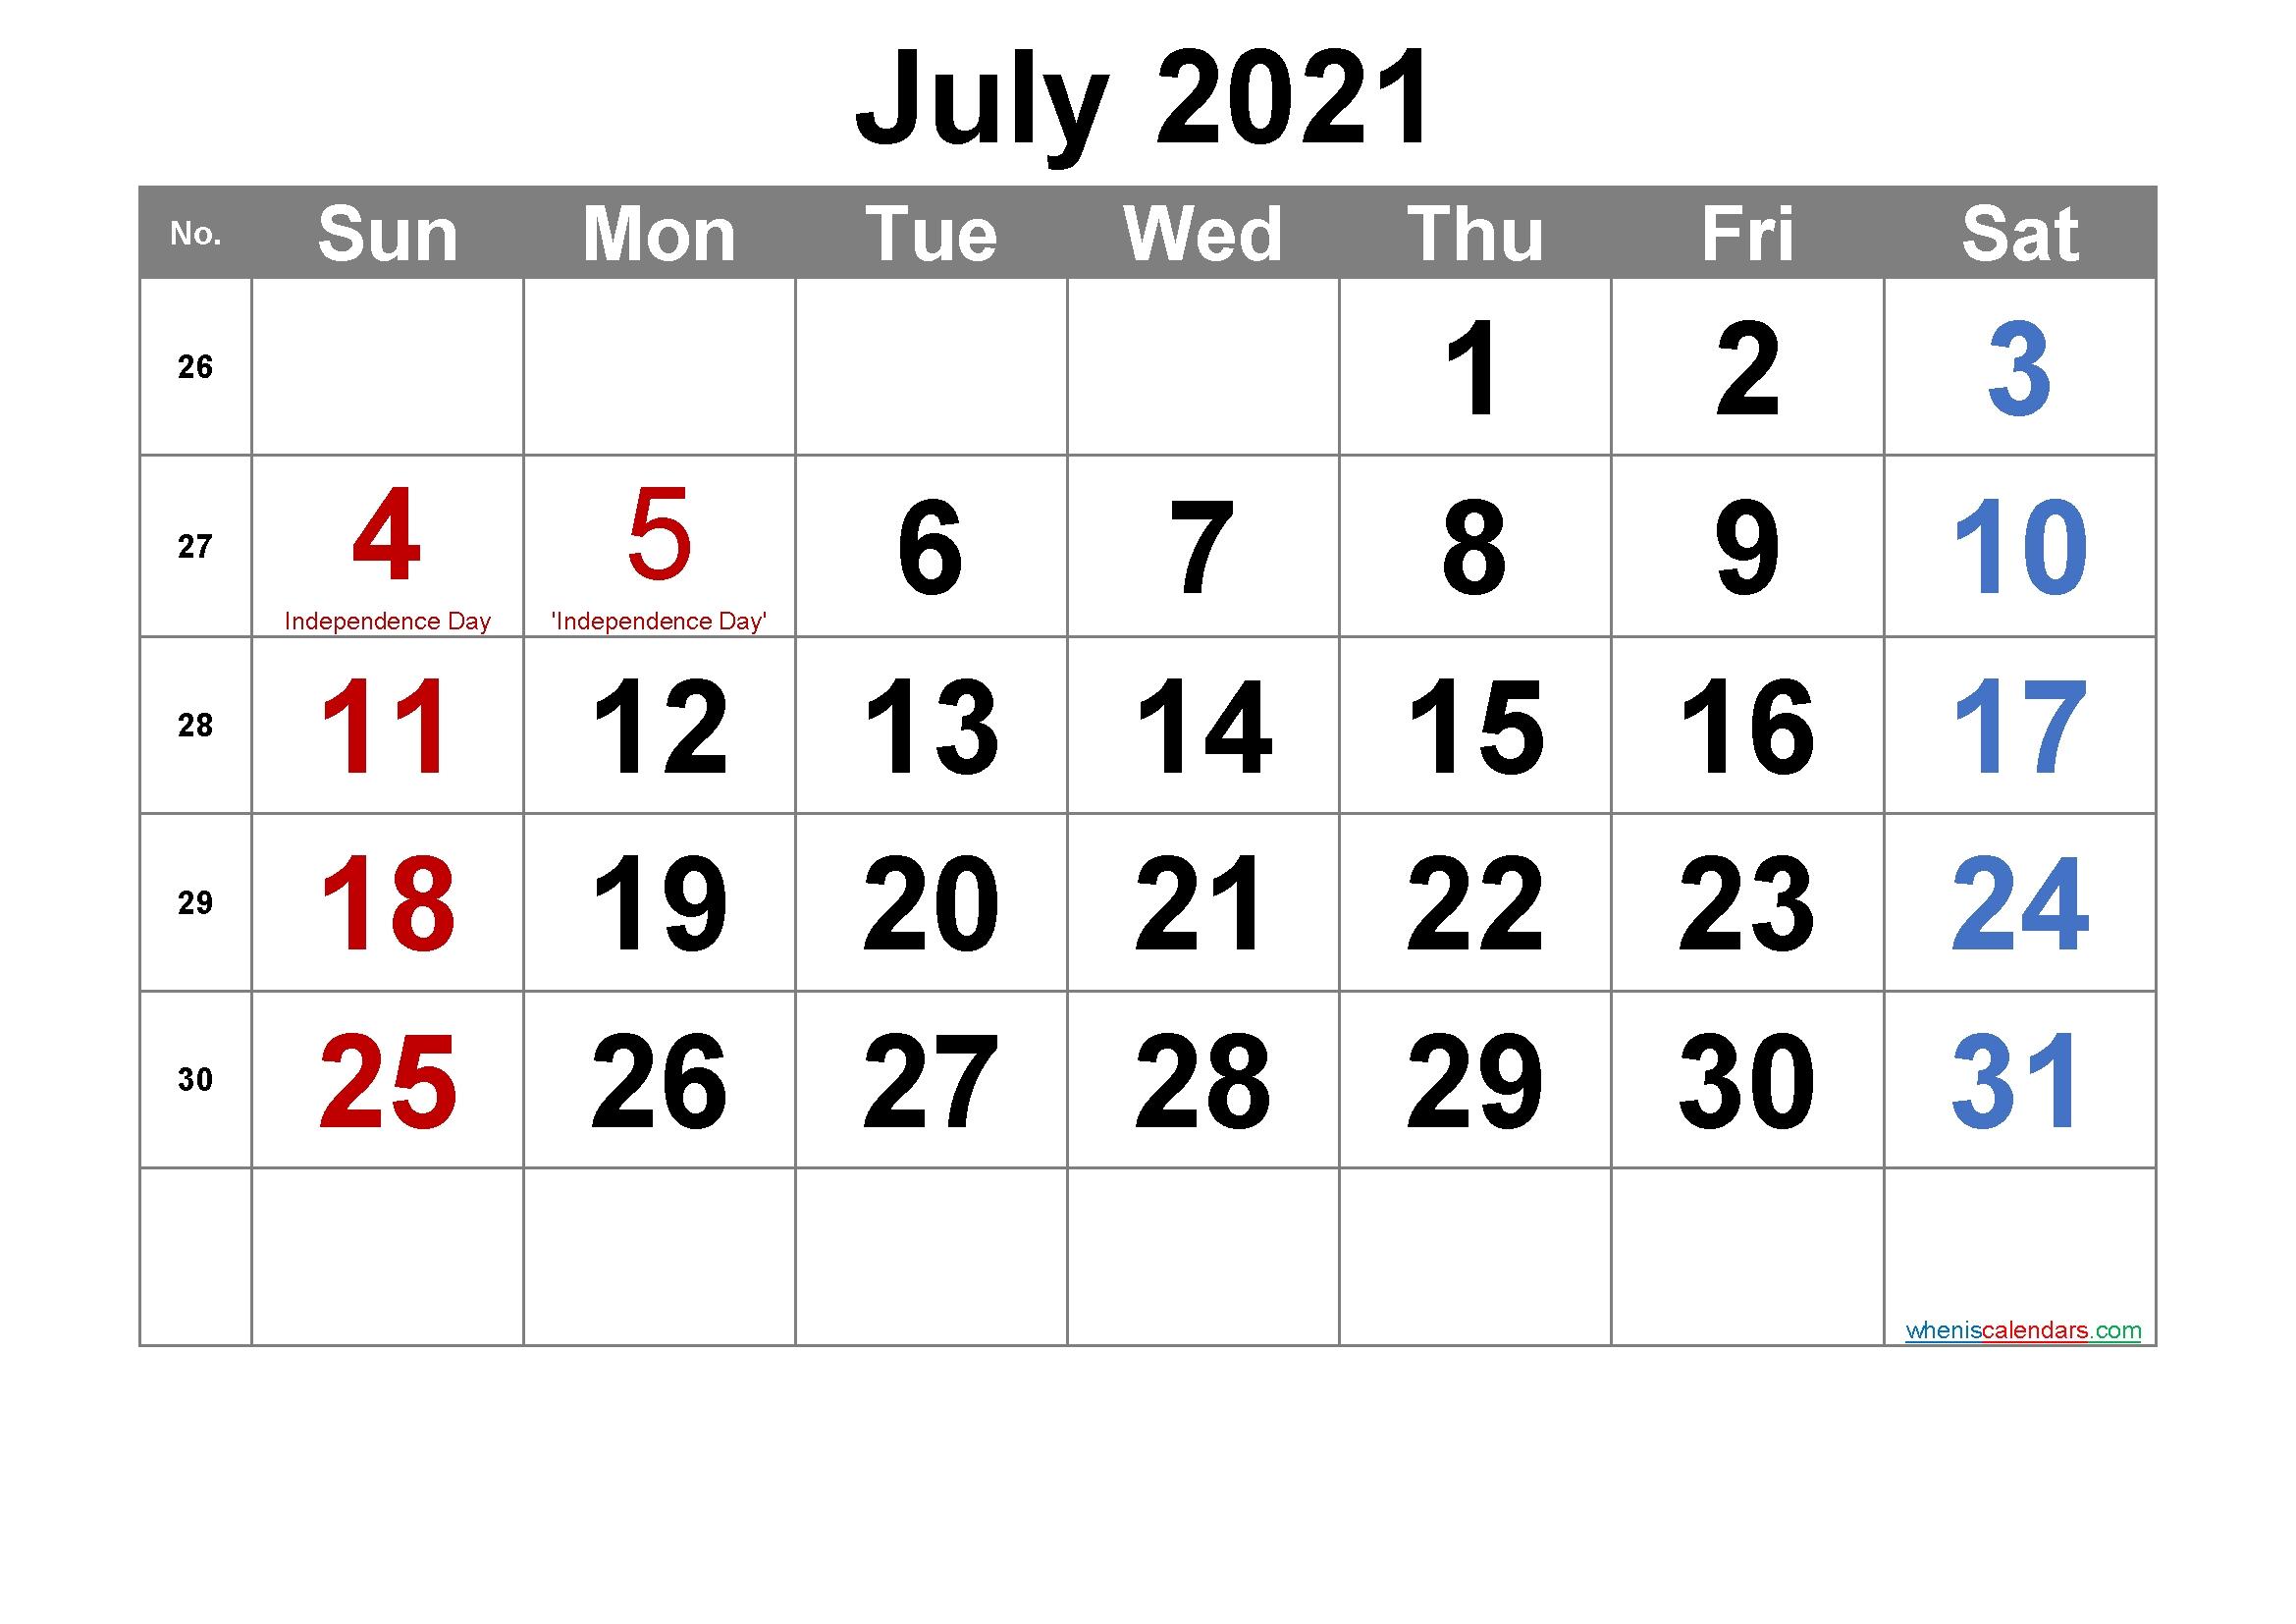 Printable July 2021 Calendar With Holidays - Calendarex July 2021 Calendar Portrait